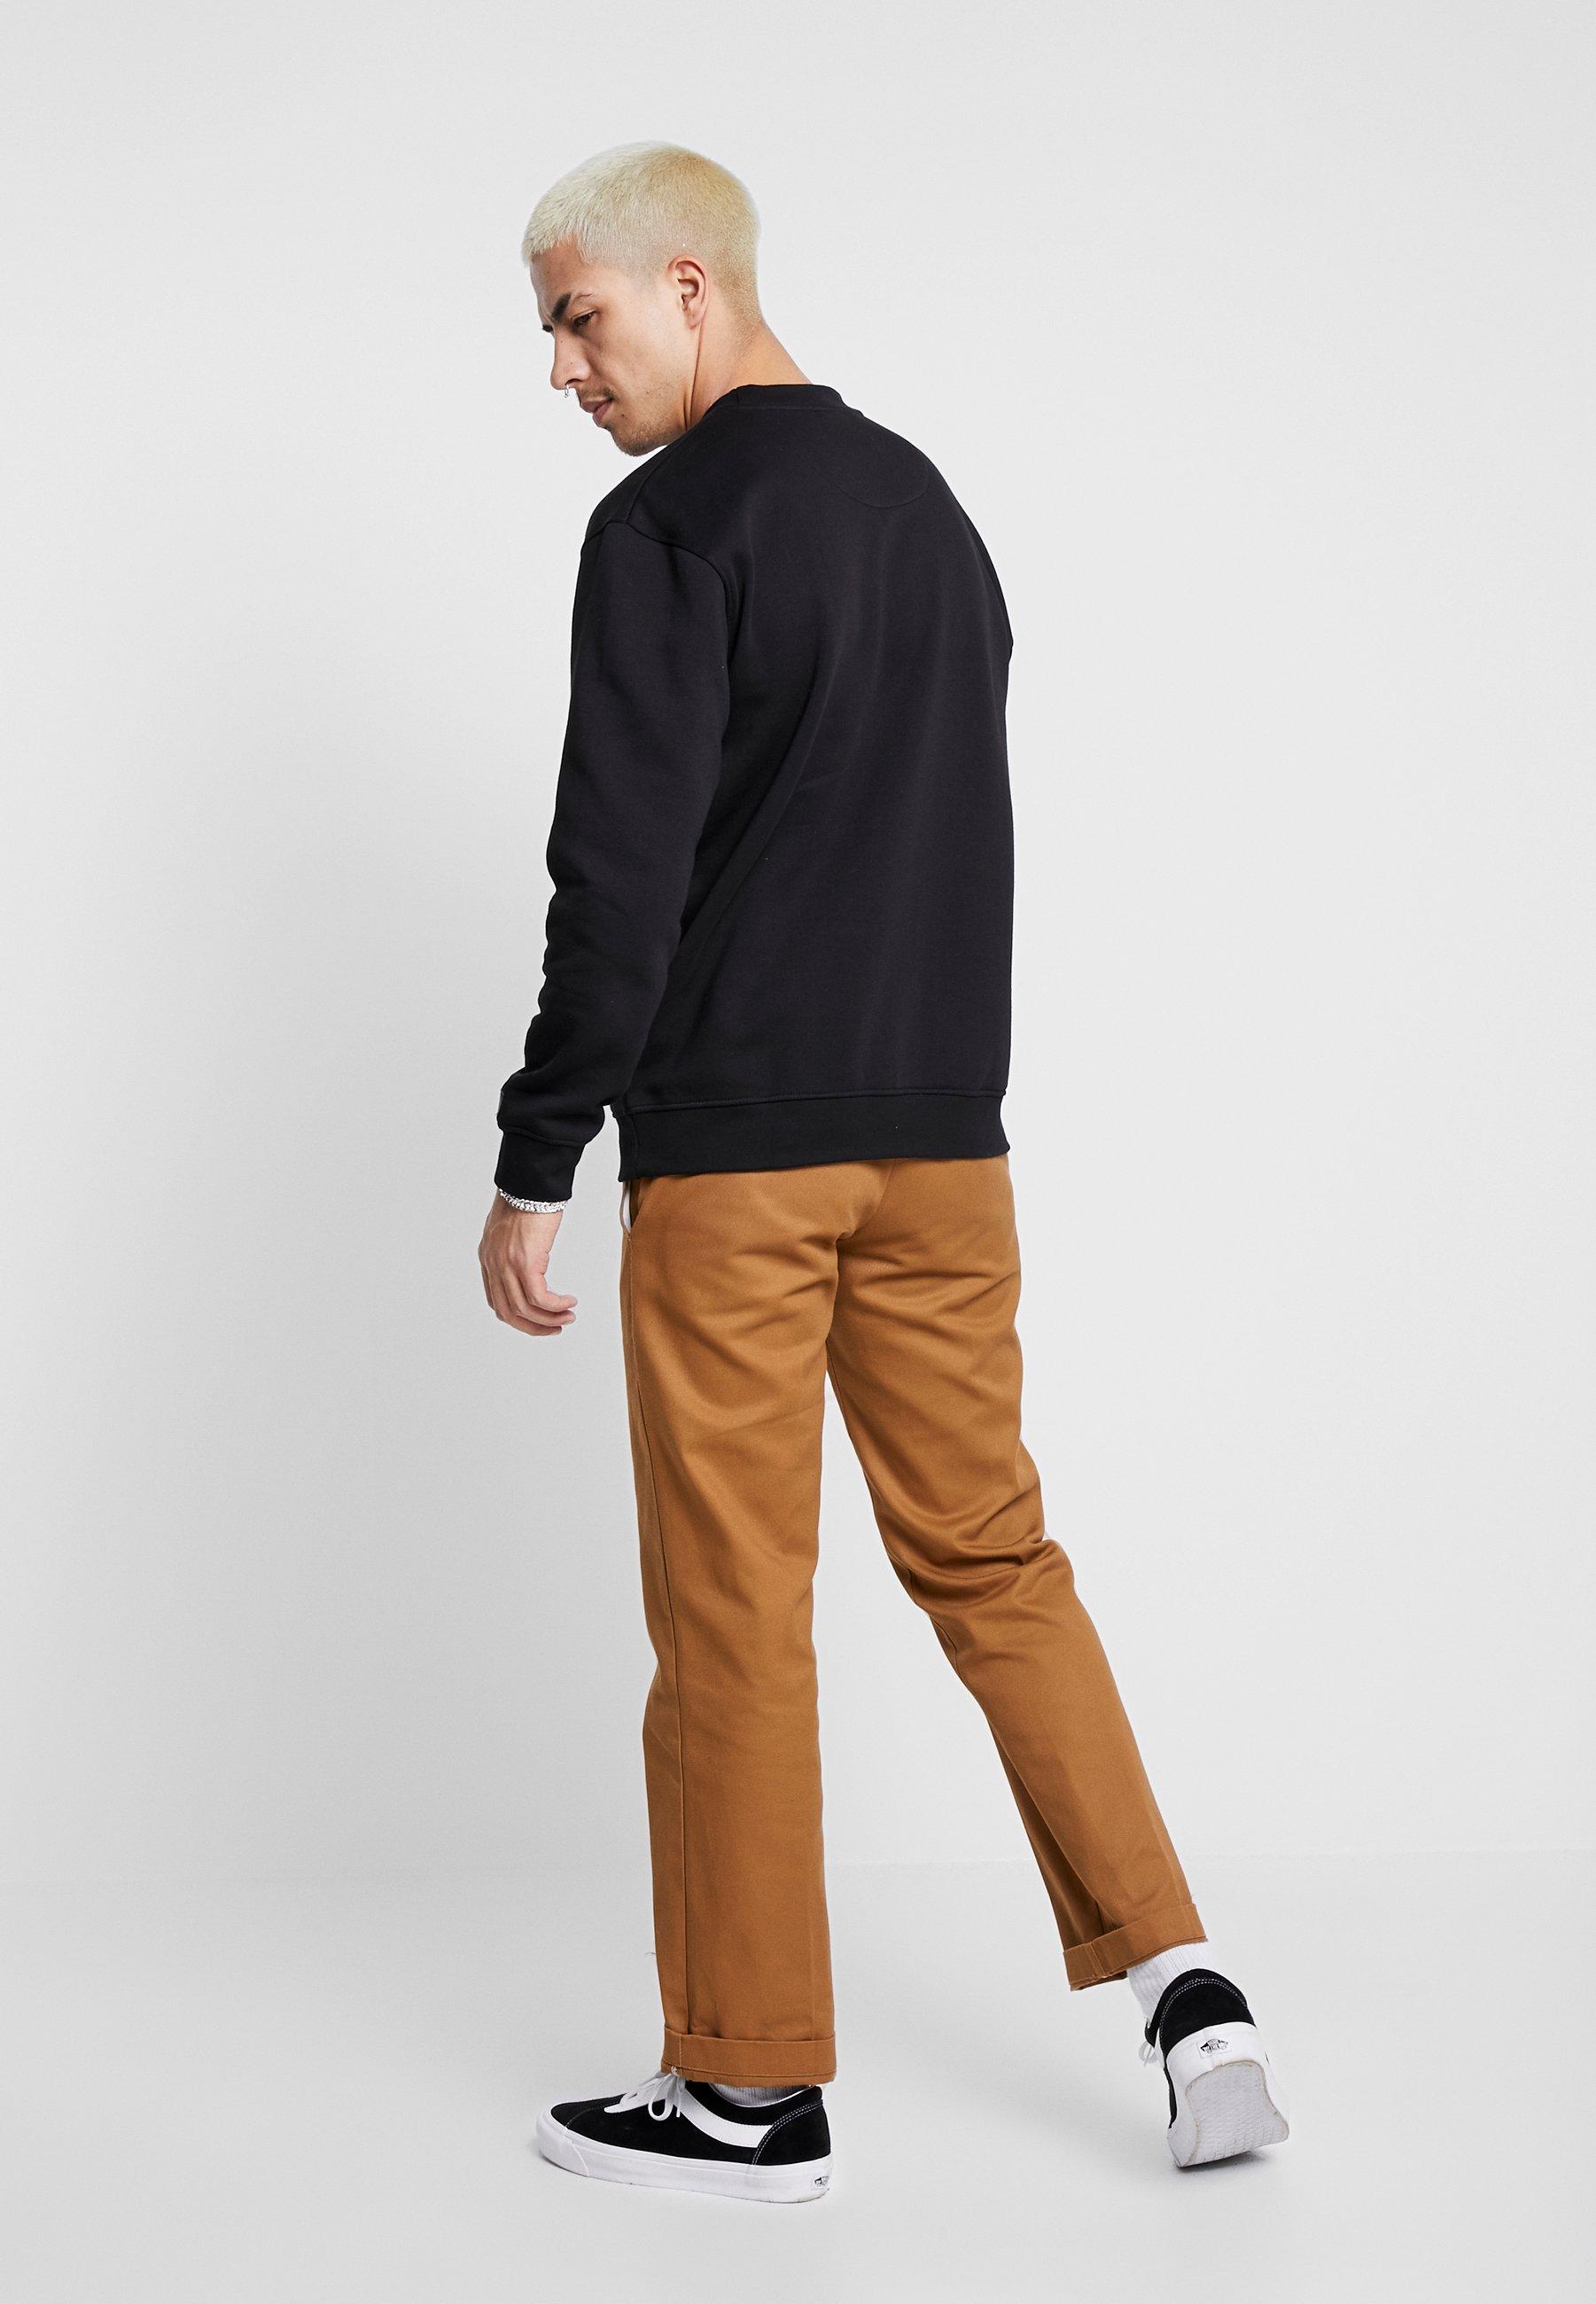 Common Kollectiv Flash Crew Neck Sweater - Sweatshirt Black